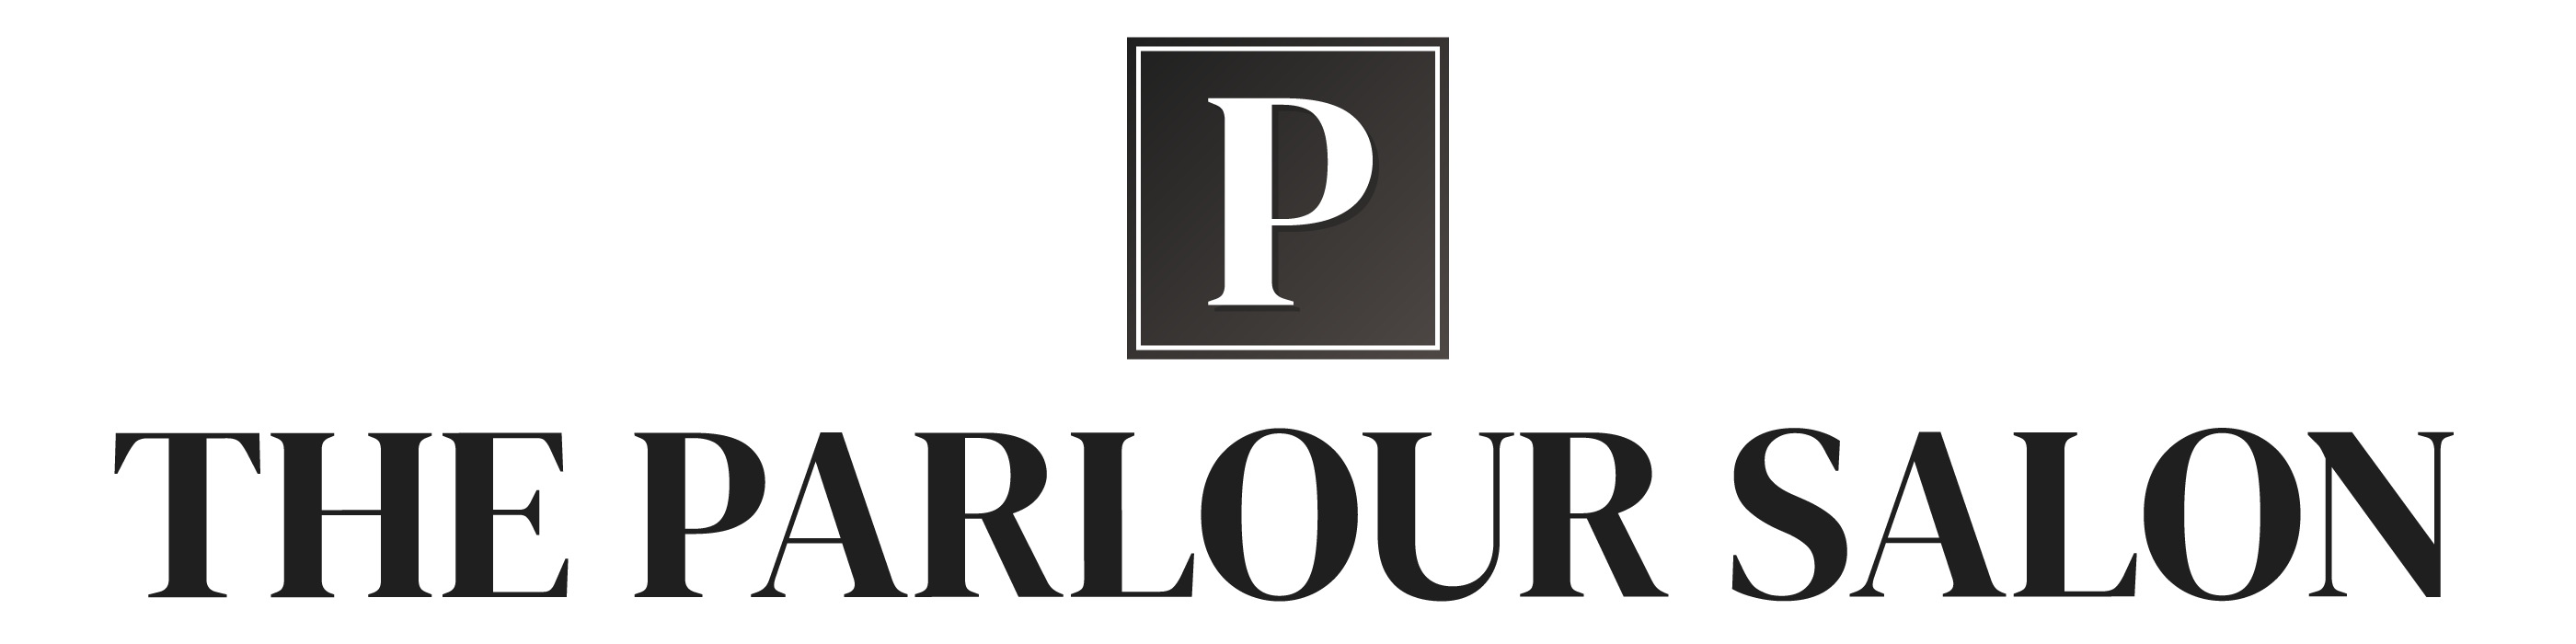 The Parlour Salon logo